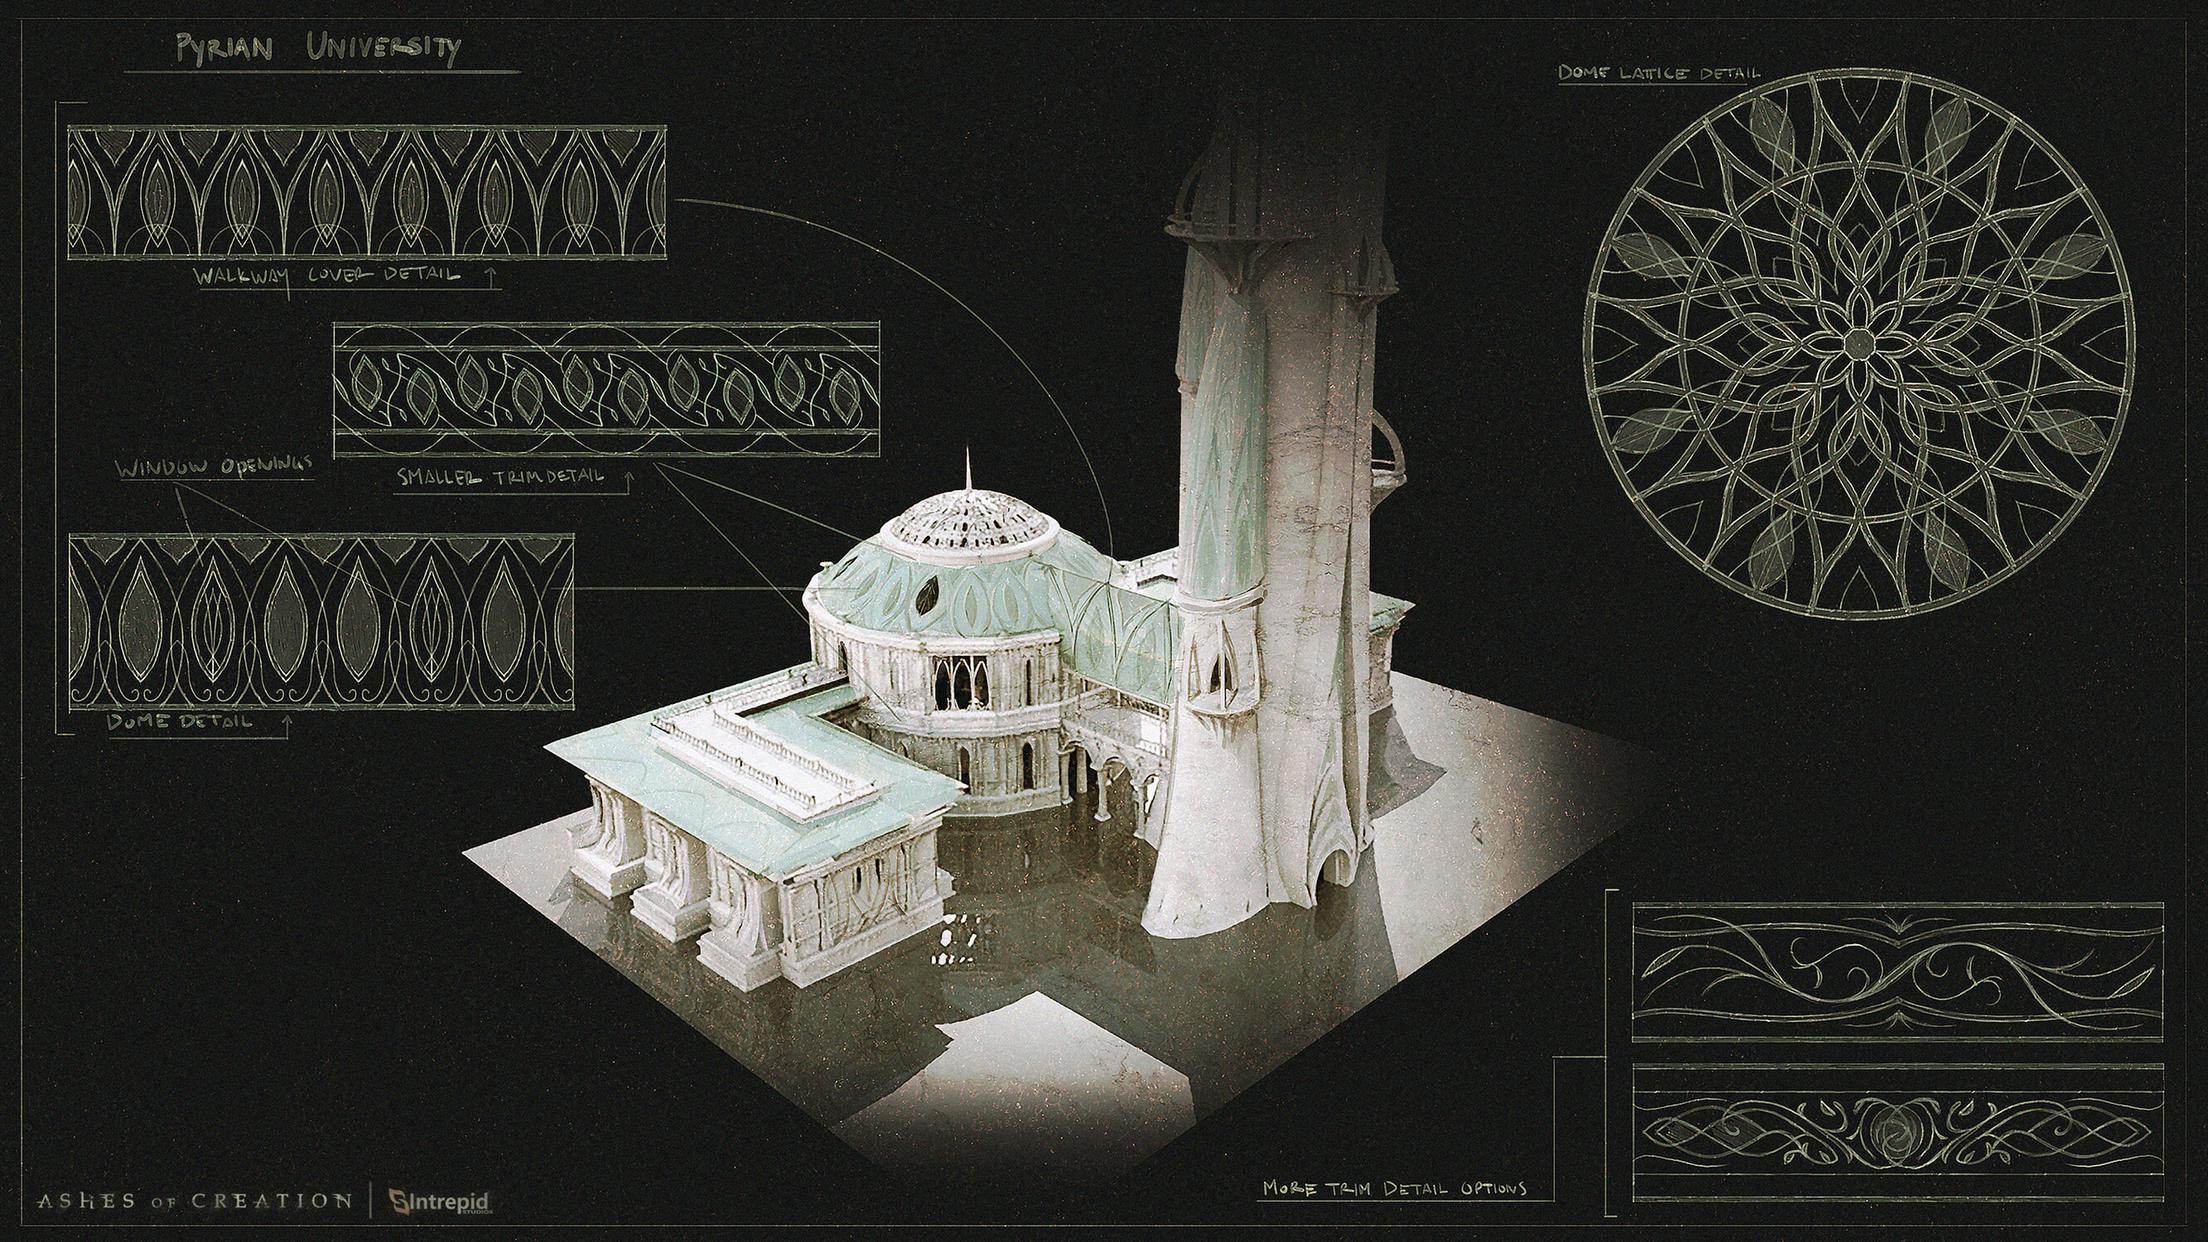 arte conceptual universidad elfos pyrian ashes of creation en español